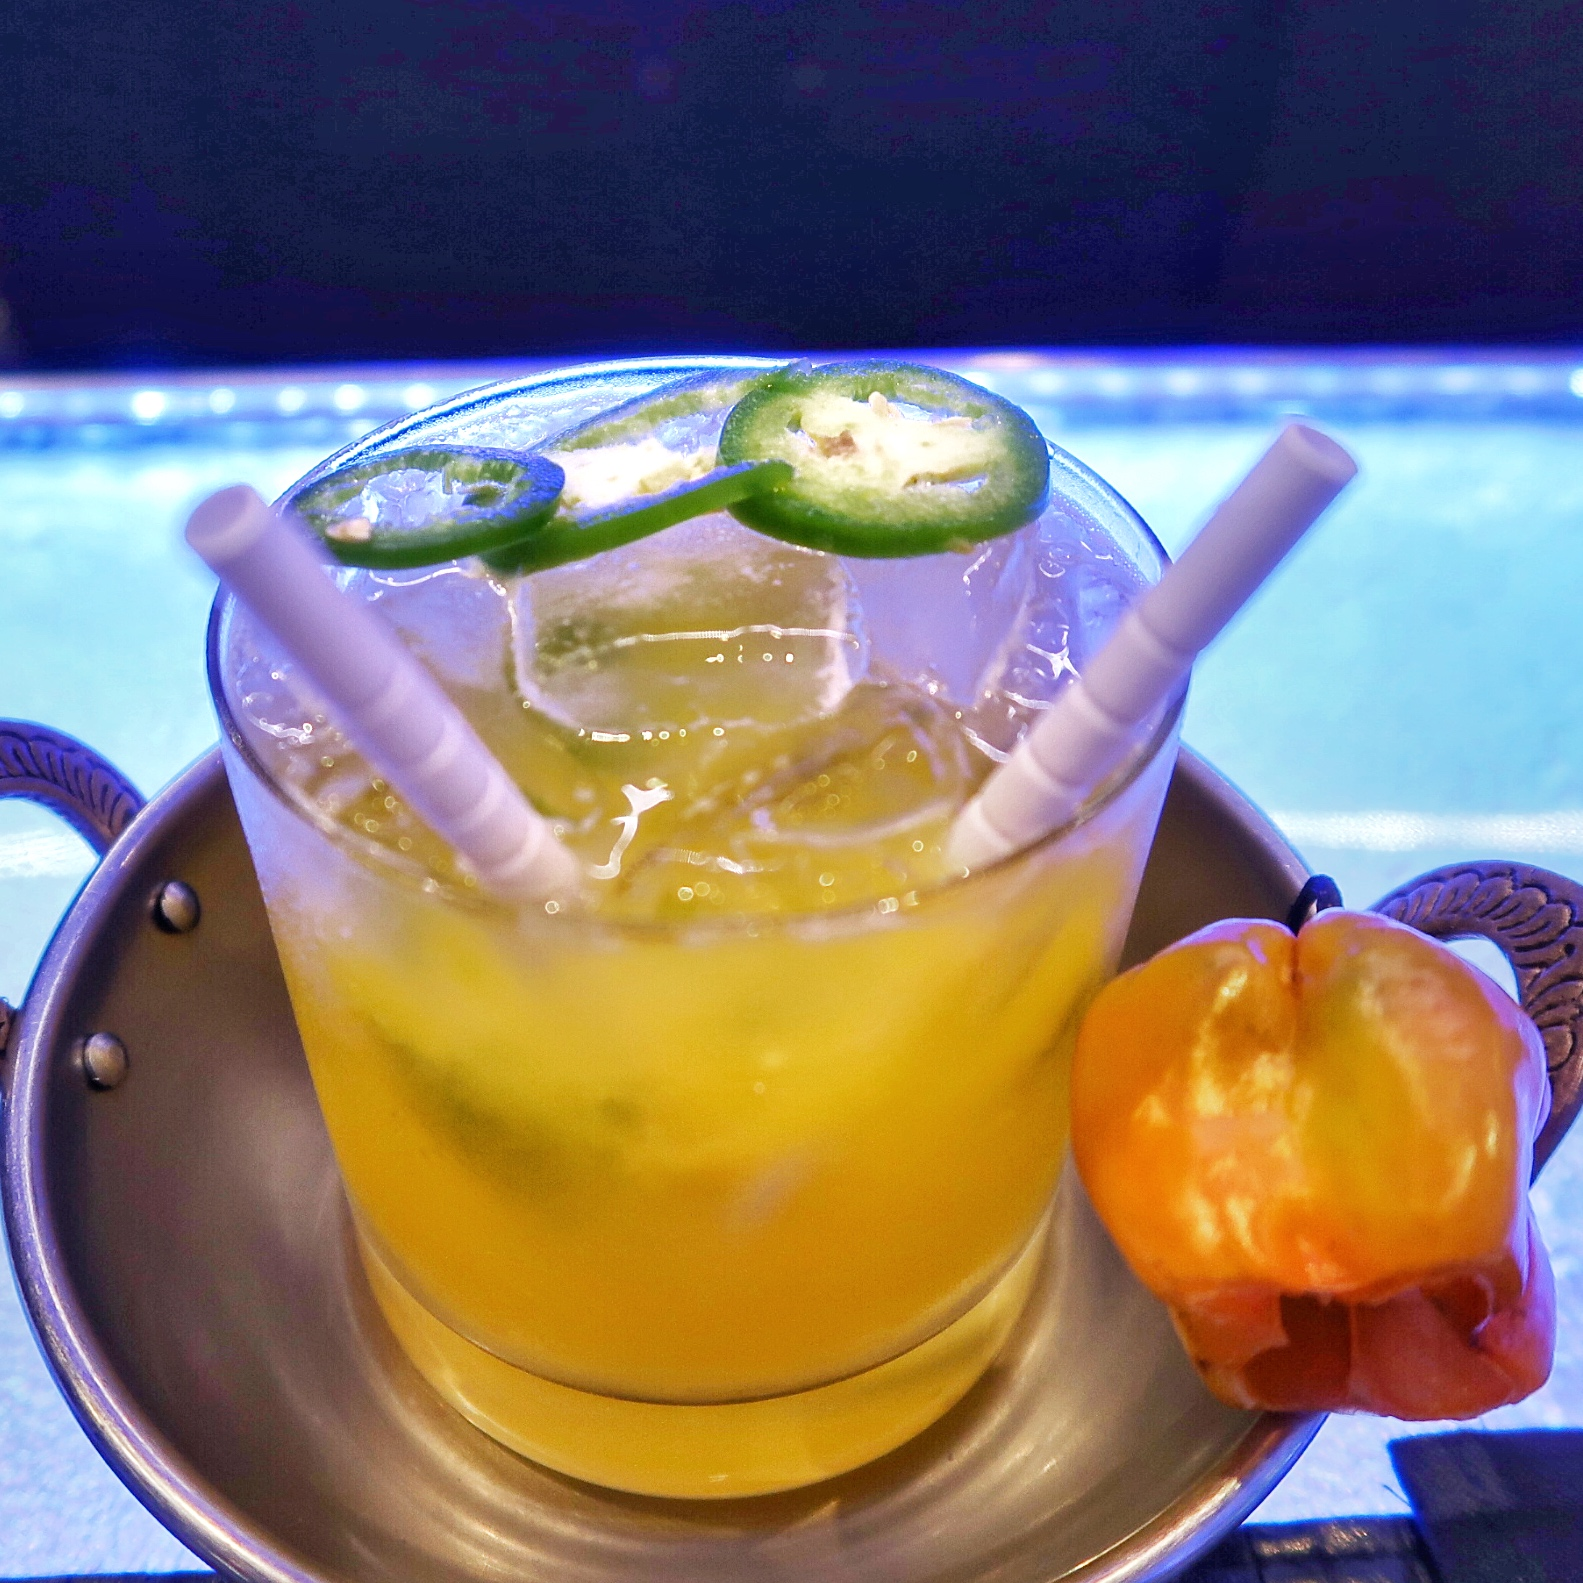 Spicy Mango Caipiroshka: vodka, mango, scotch bonnet syrup, lime